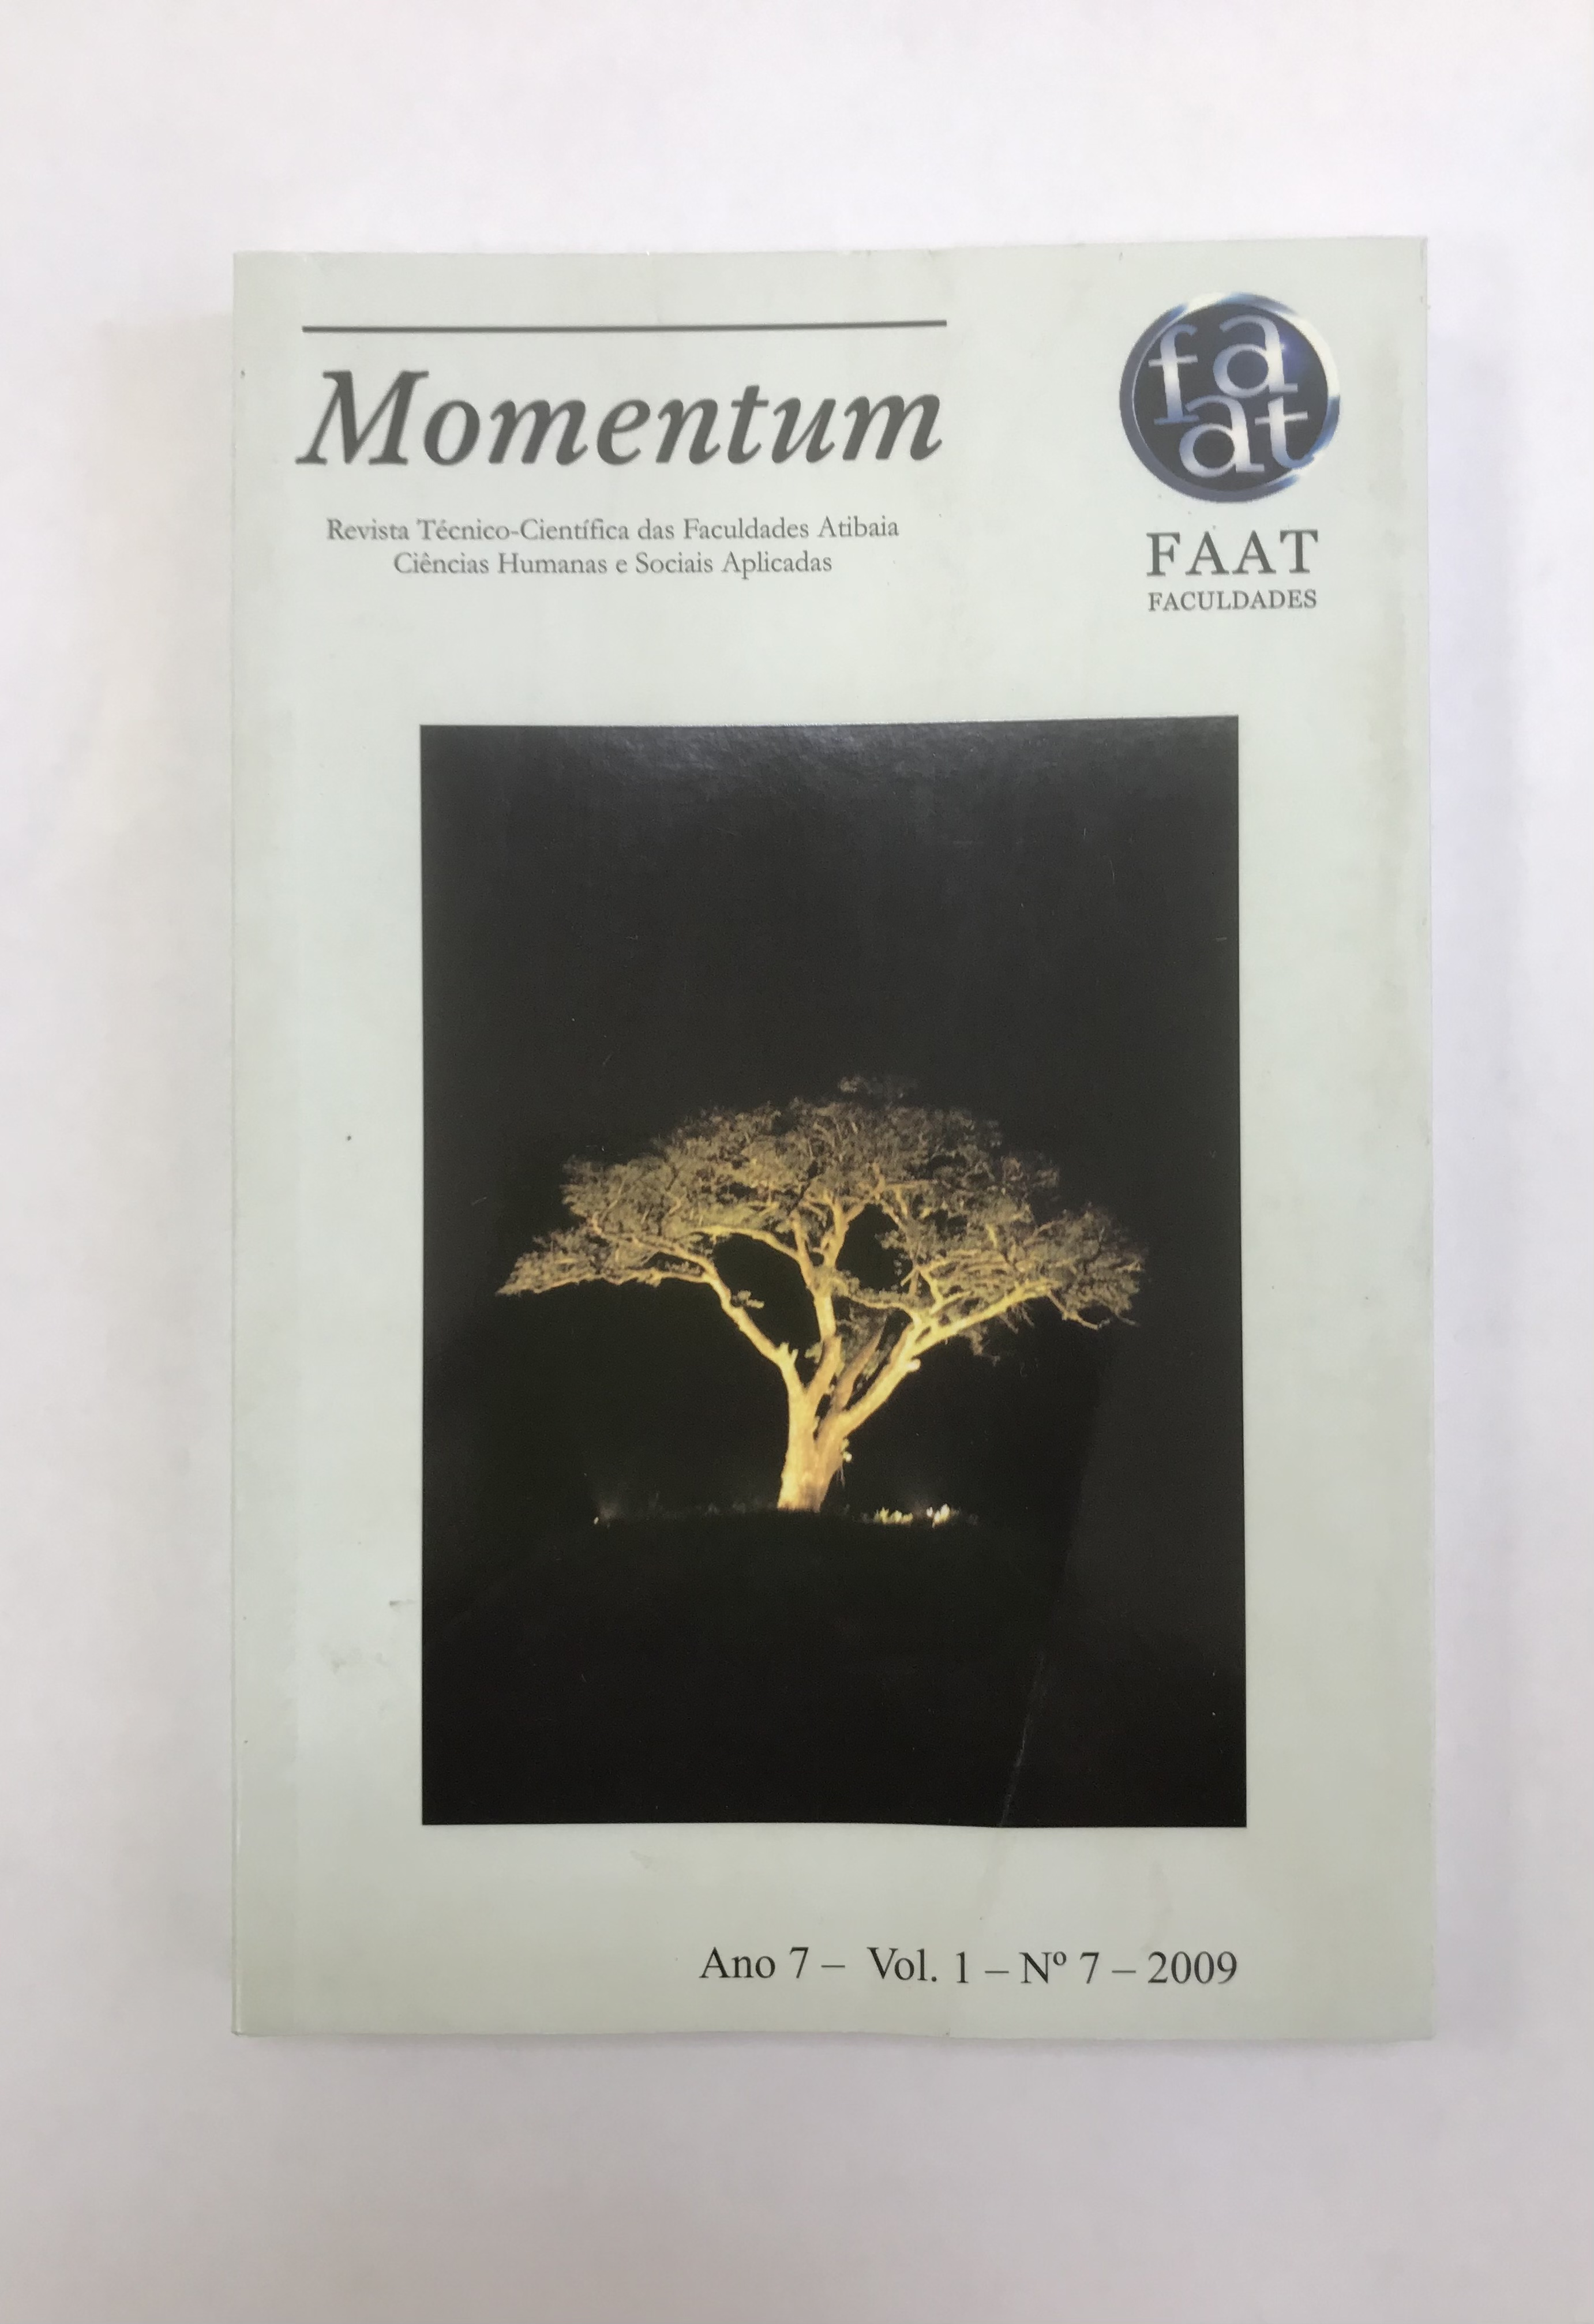 Visualizar v. 1 n. 7 (2009): Momentum